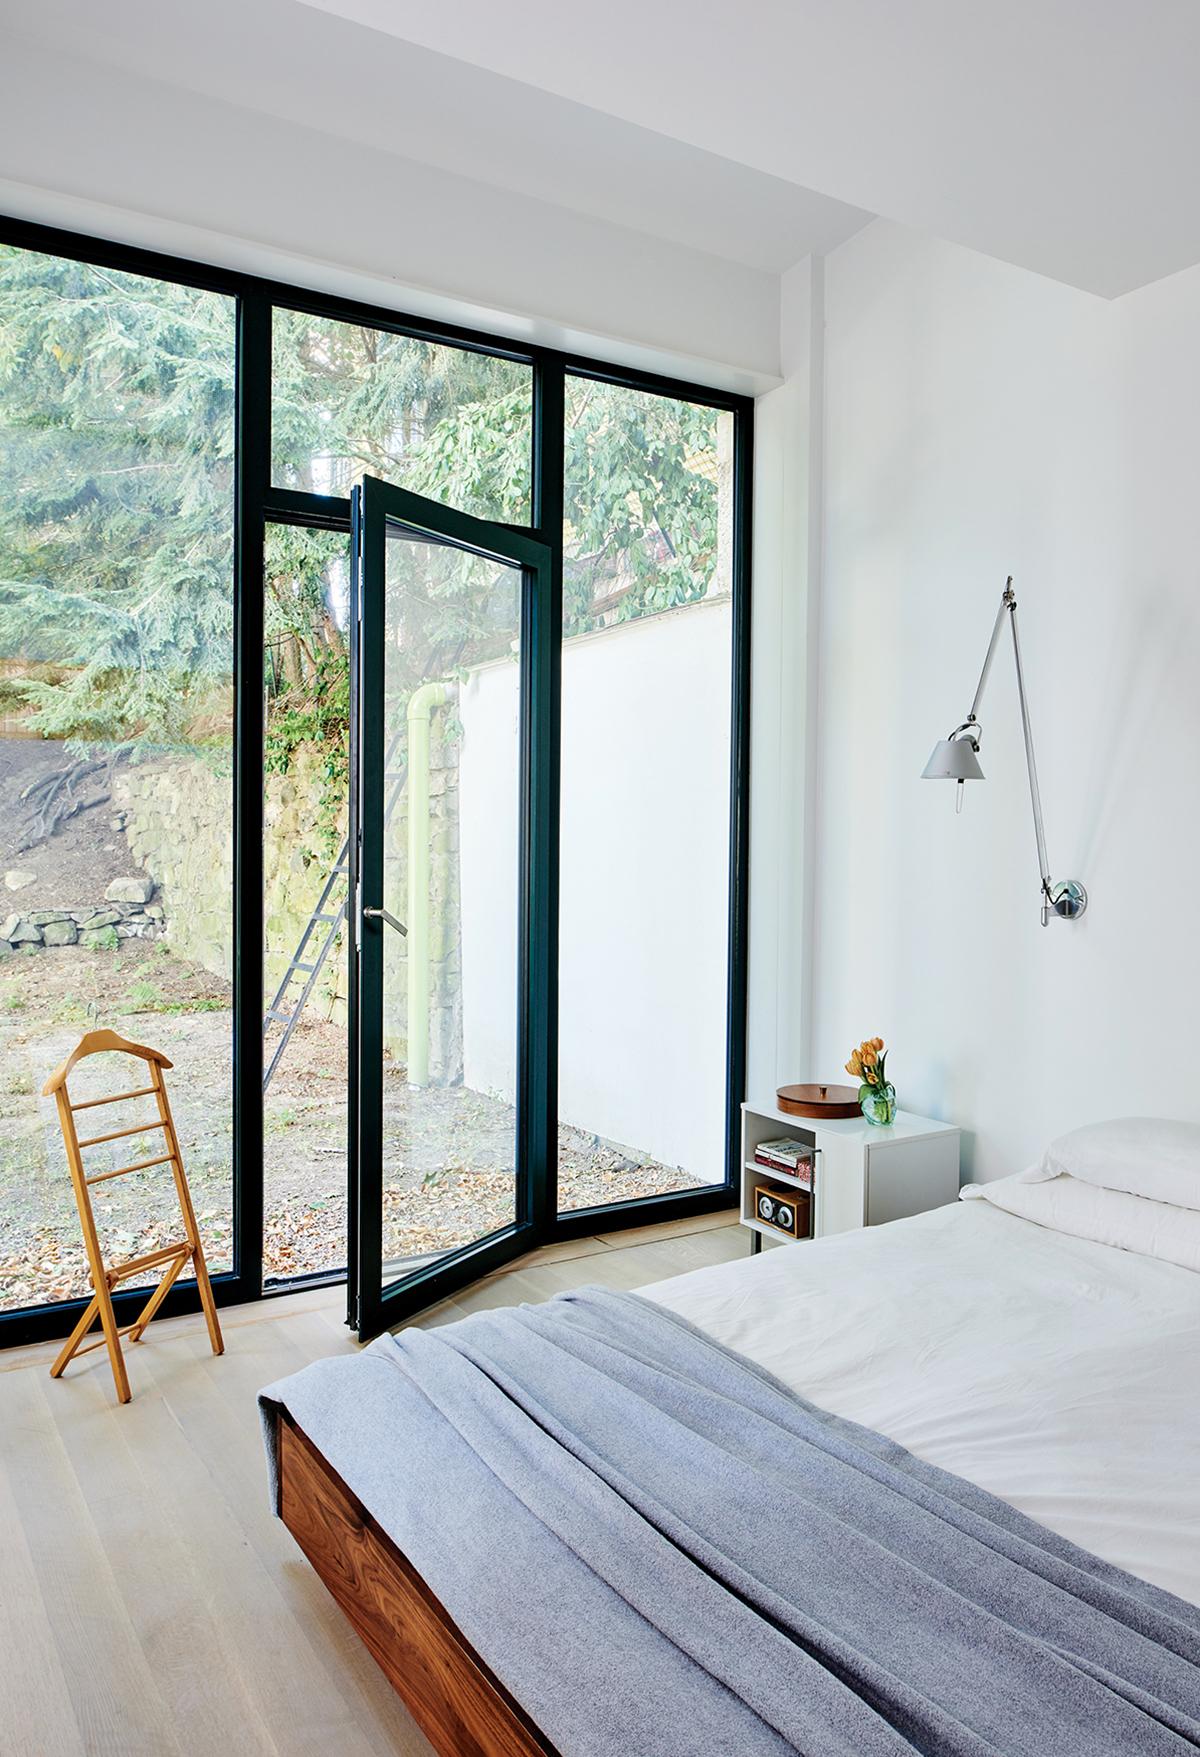 cambridge-midcentury-modern-home-renovation-7 2.jpg